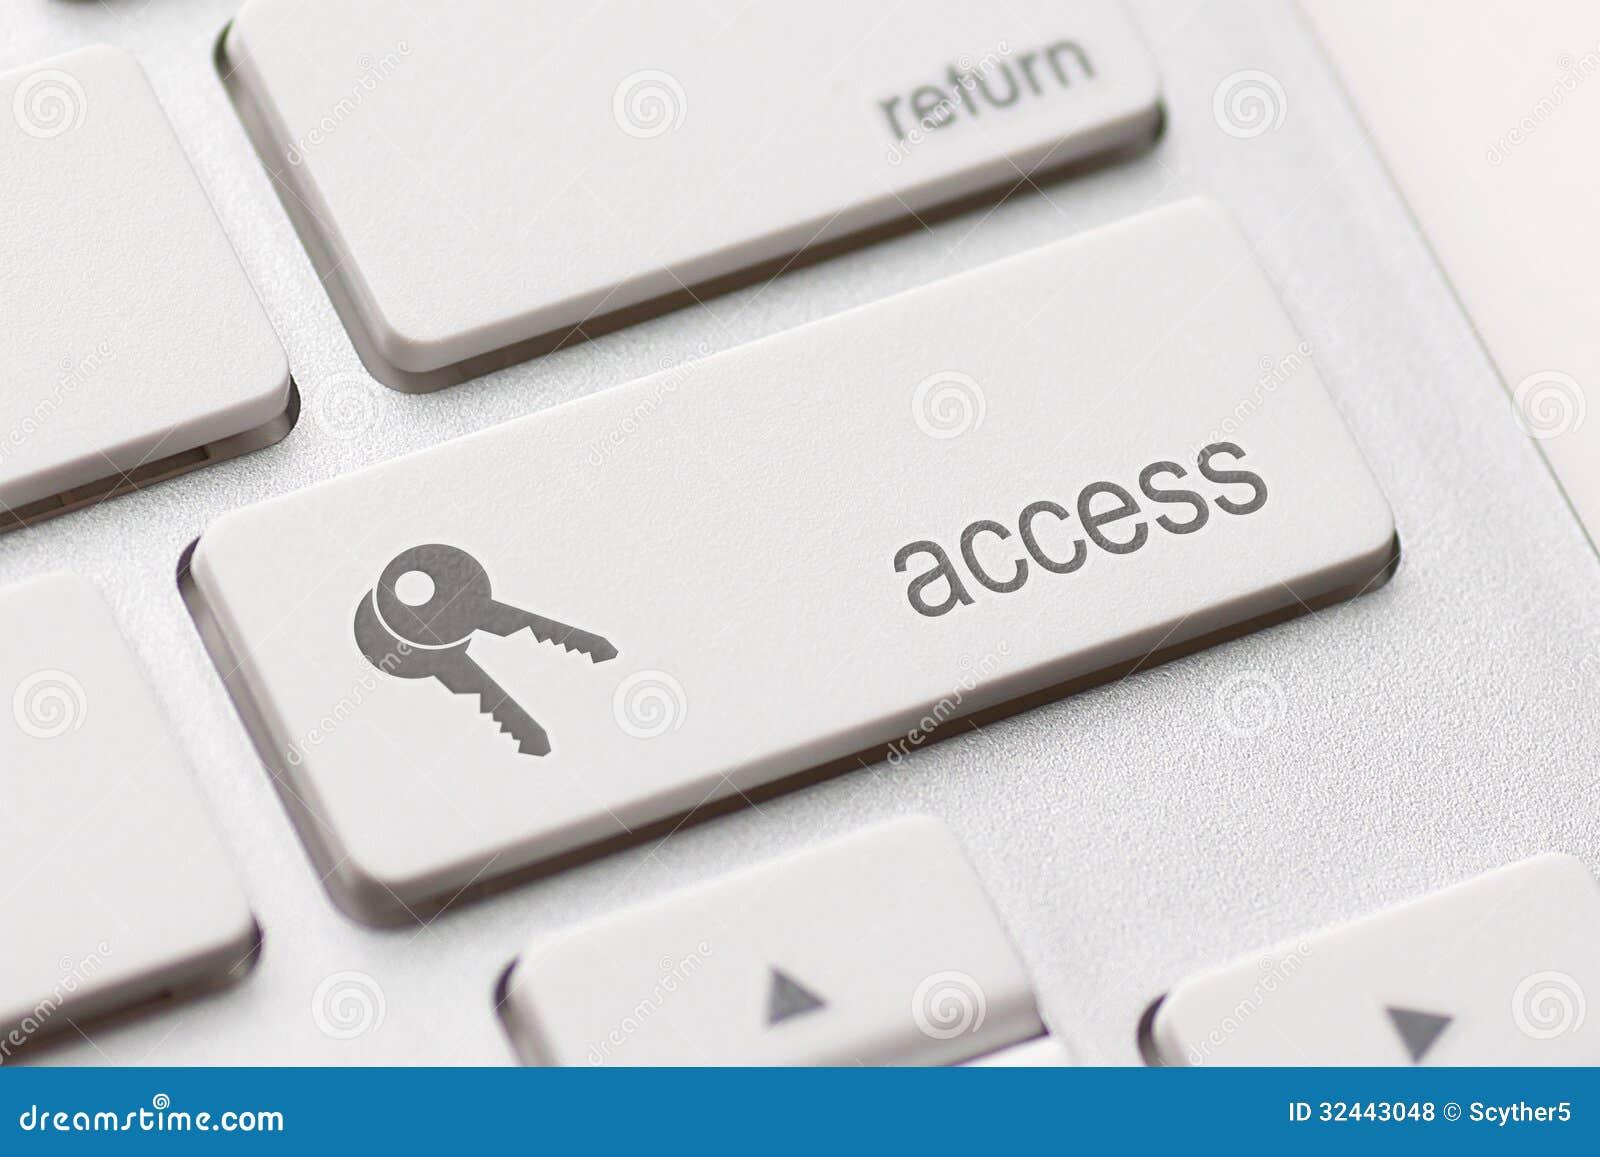 Access Enter Key Royalty Free Stock Photos - Image: 32443048